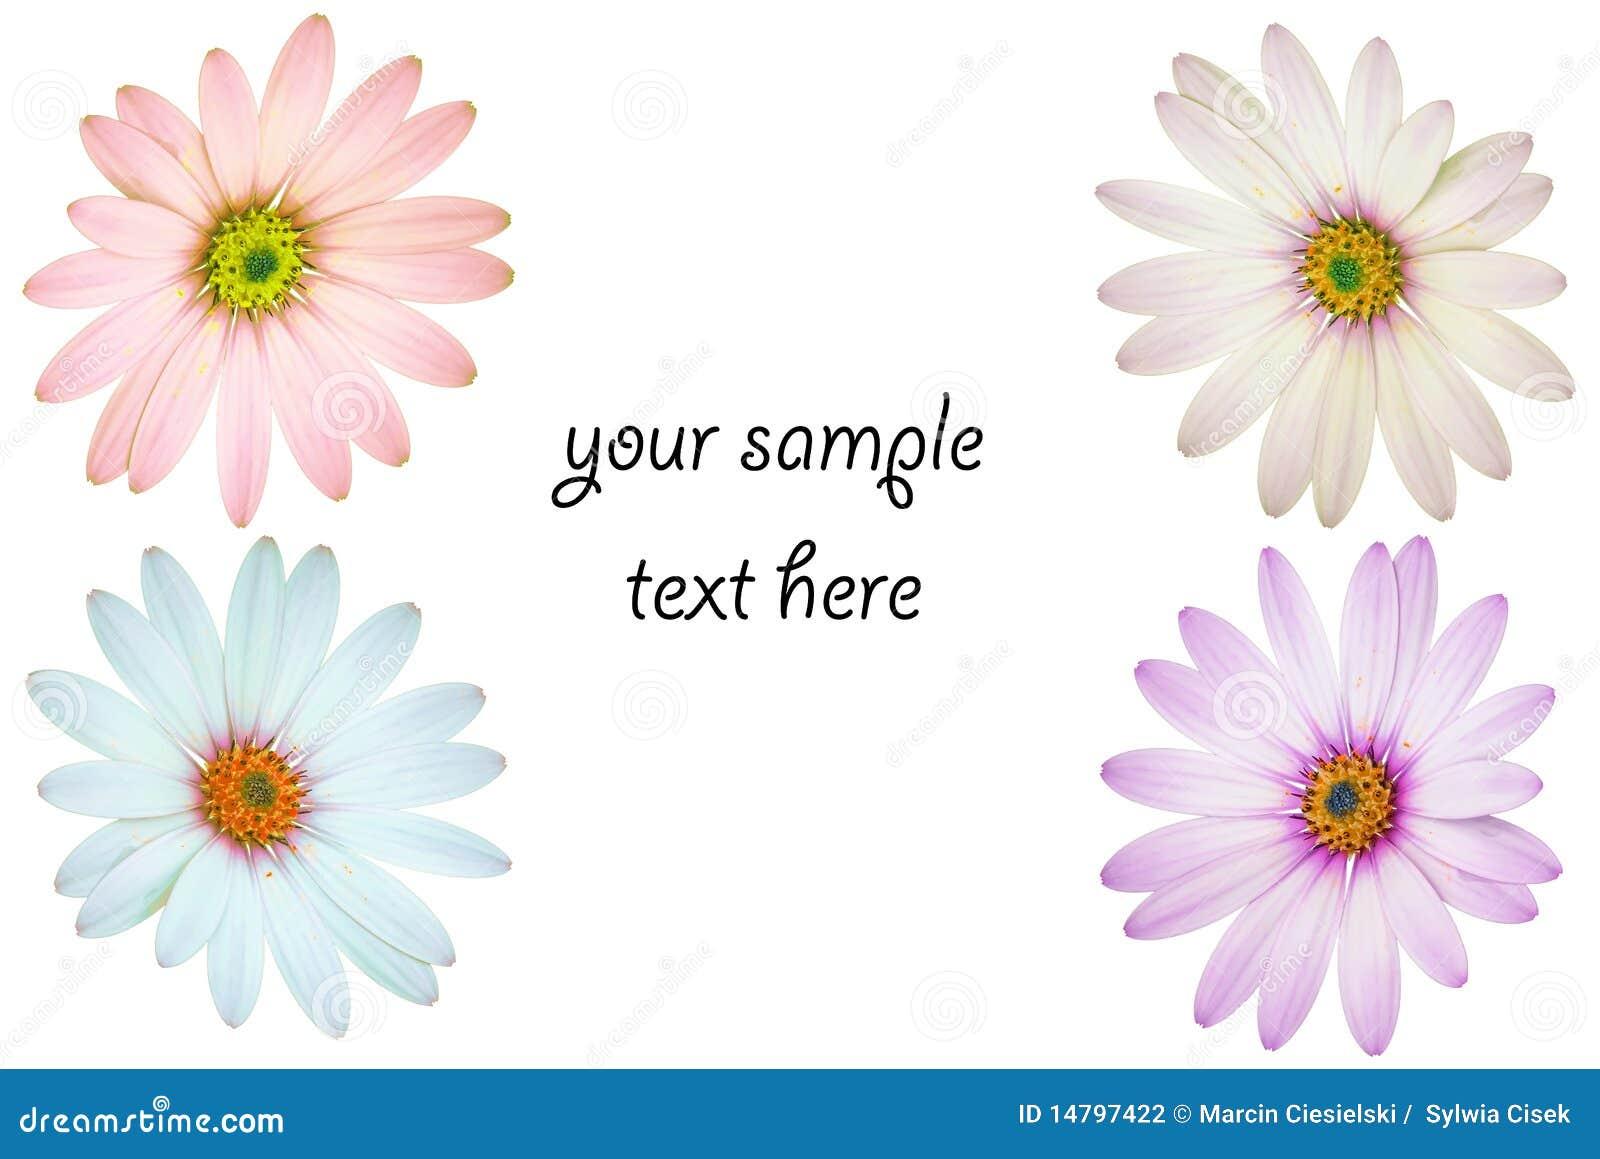 Flowery template stock photo. Image of flower, season - 14797422